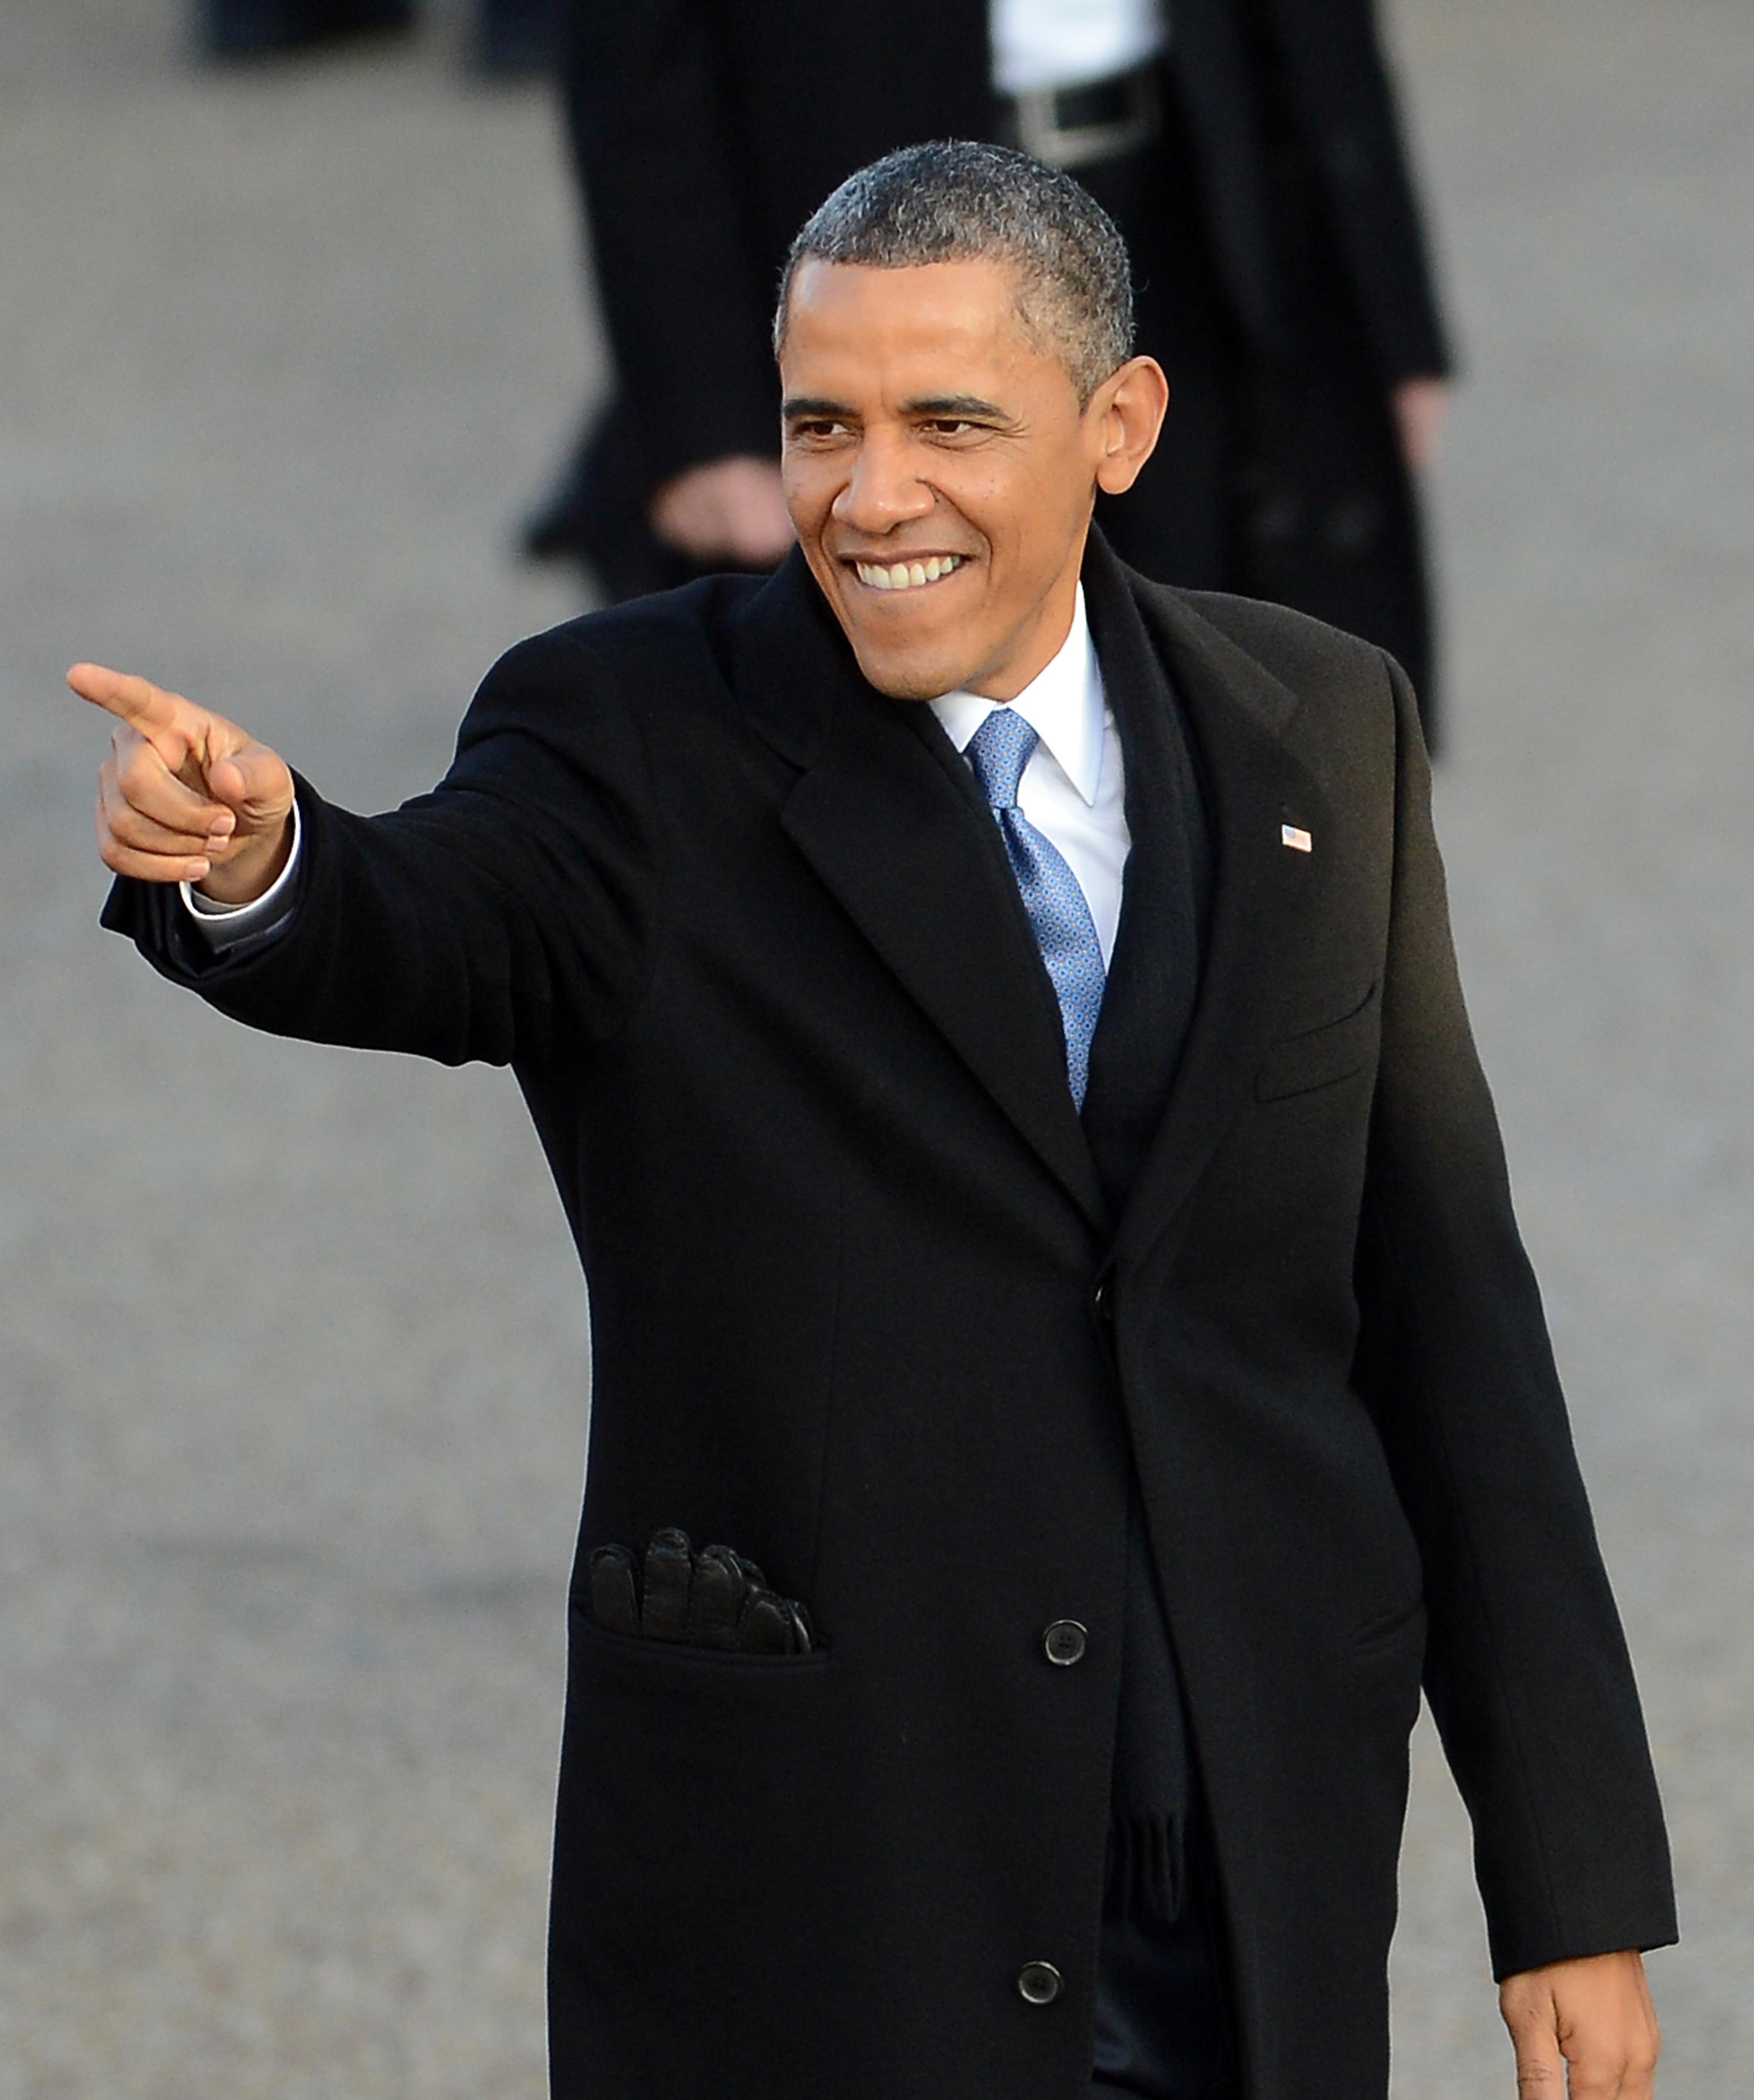 President 2013 Inauguration President Obama Inauguration